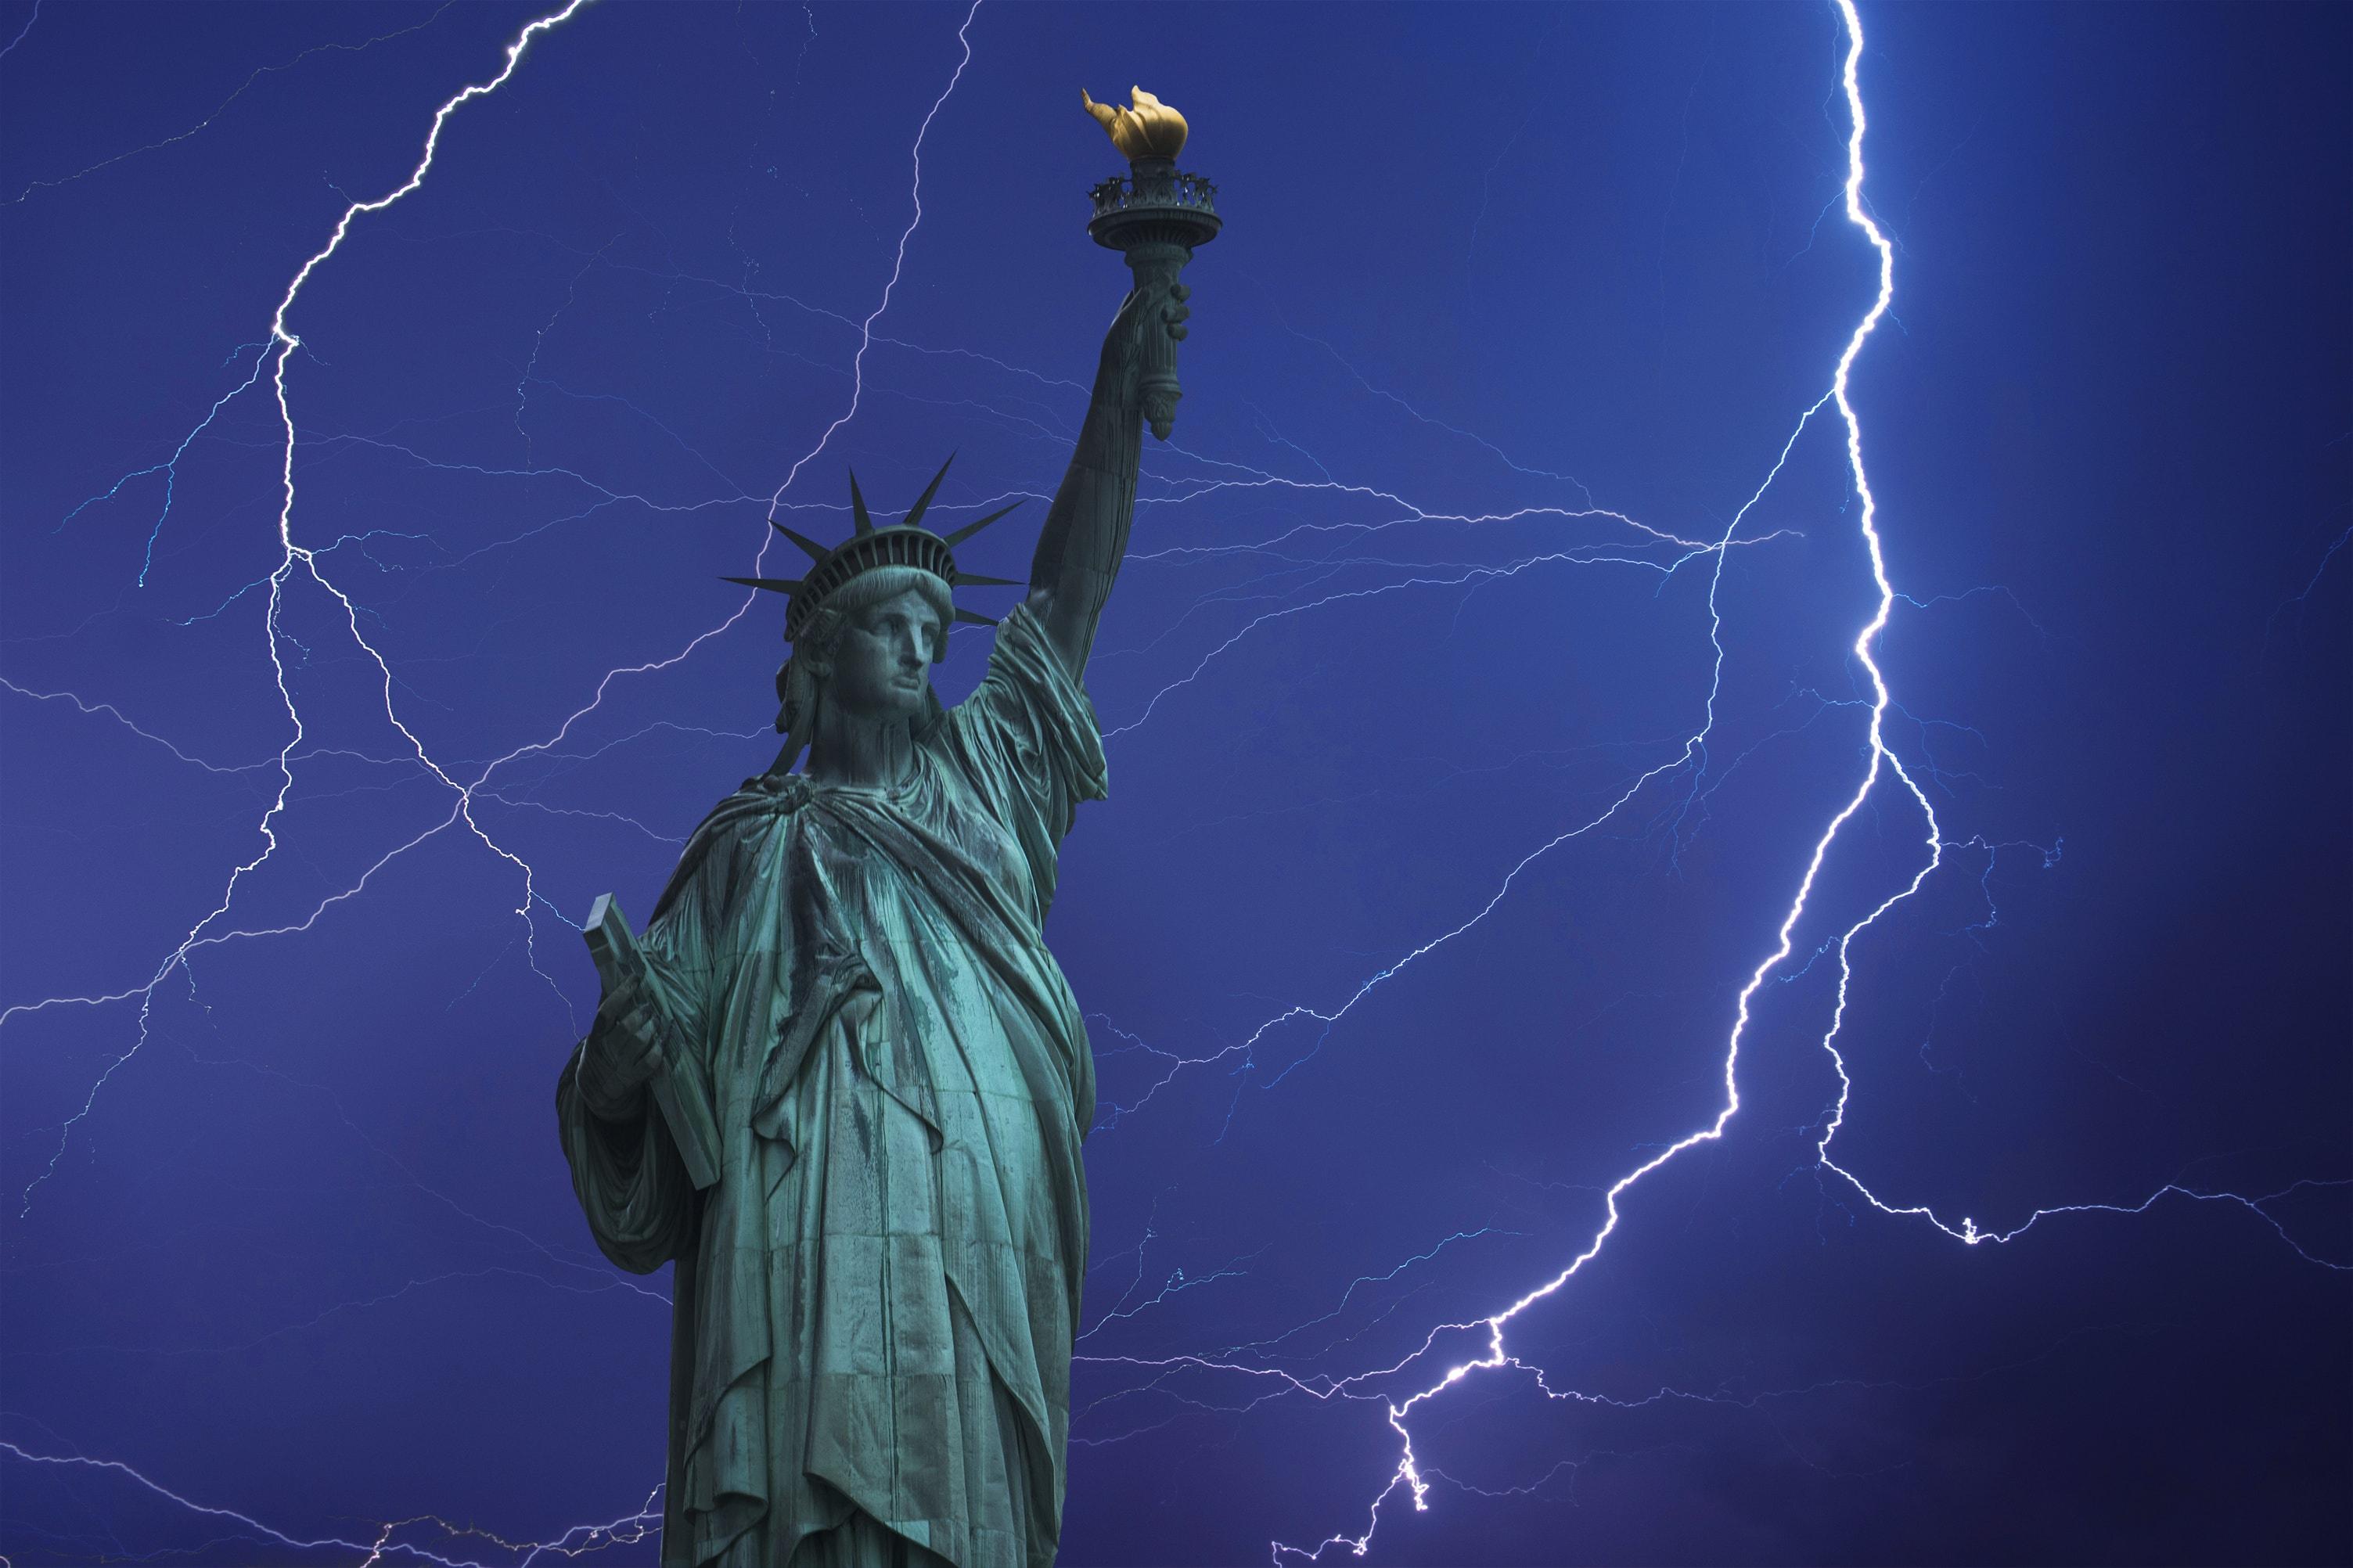 New-york-city-staten-island-lightning-storm-damage